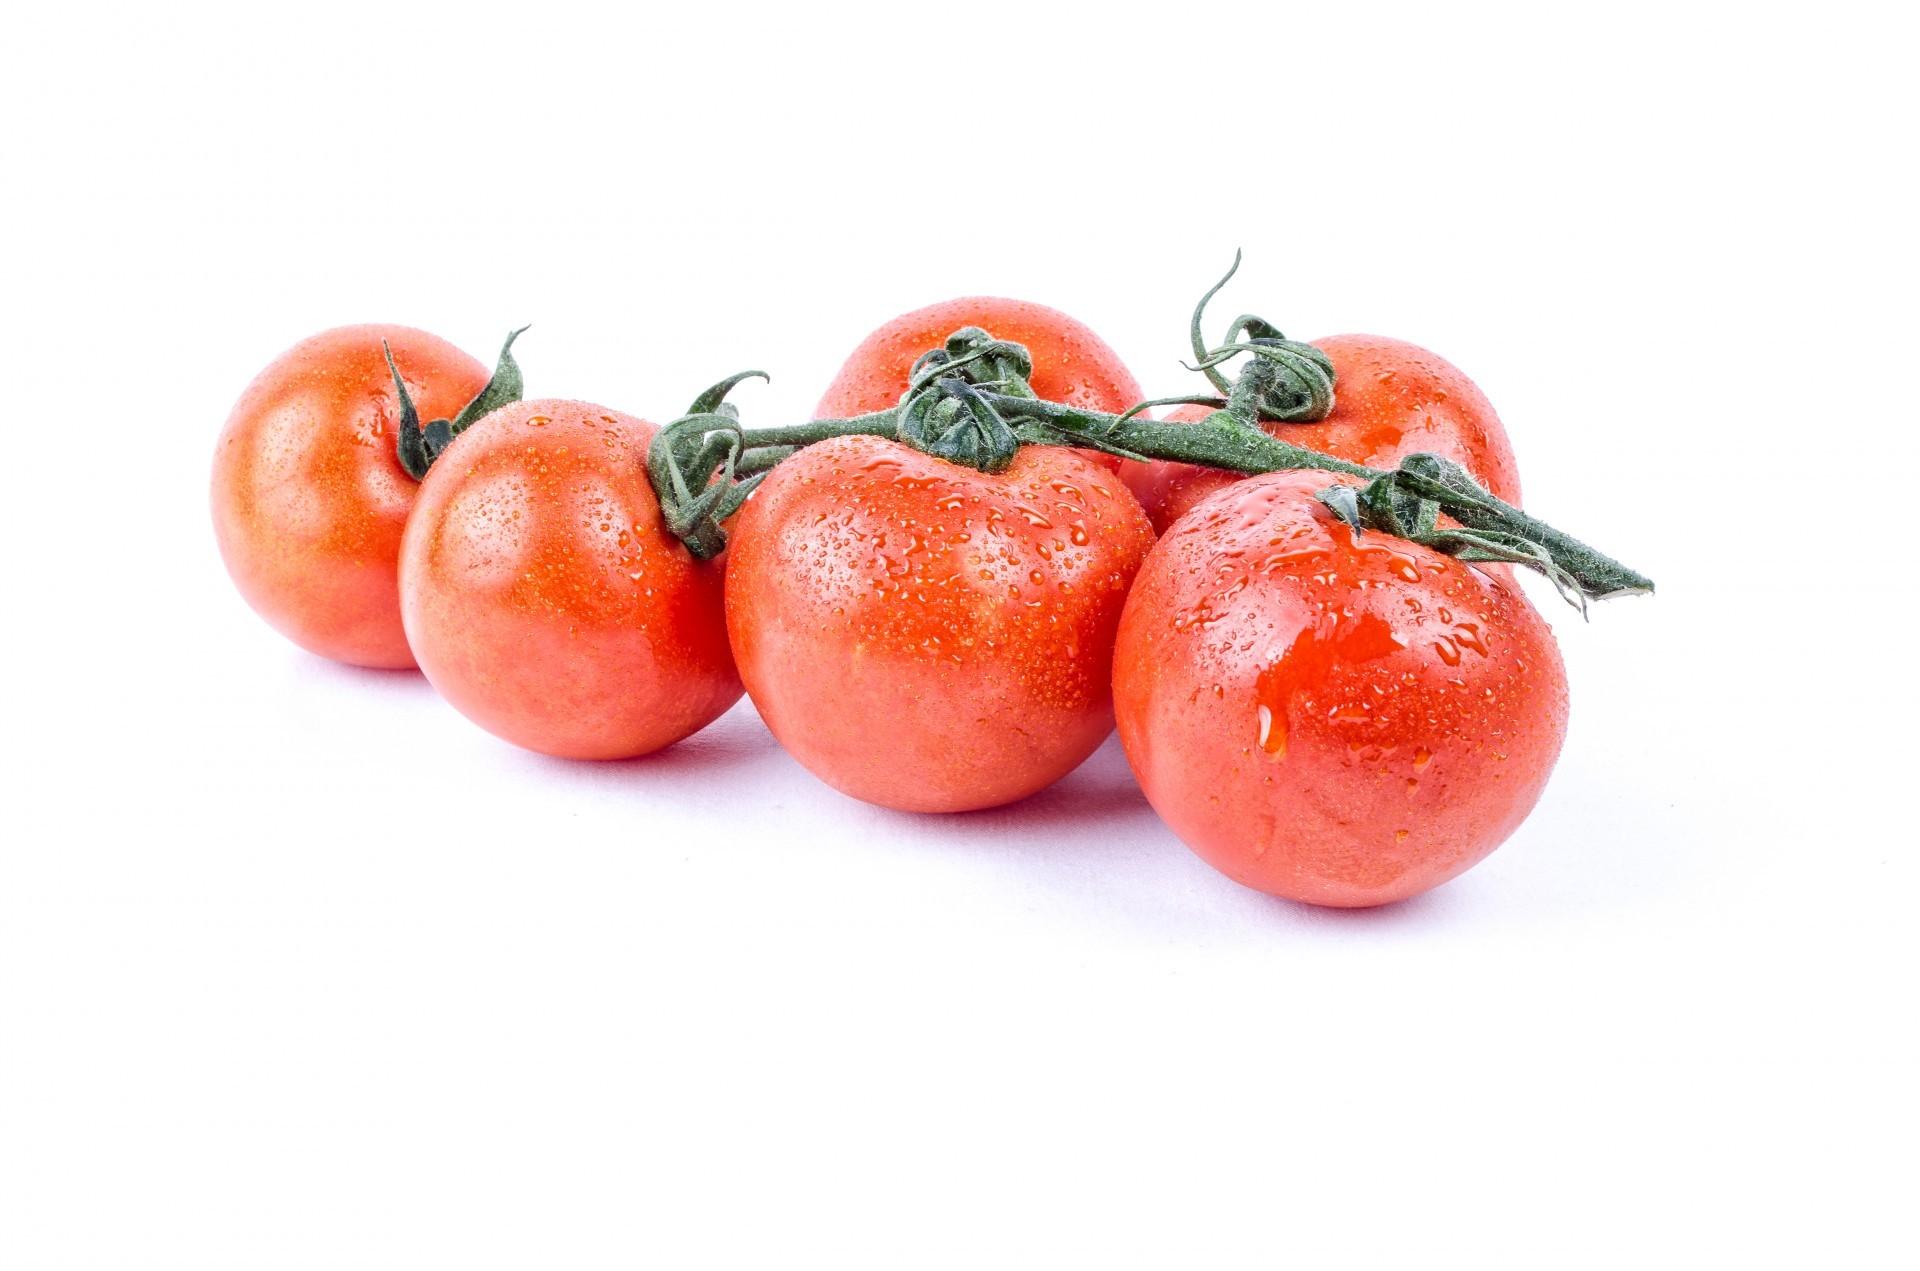 fresh-tomatoes-1395914207vuY